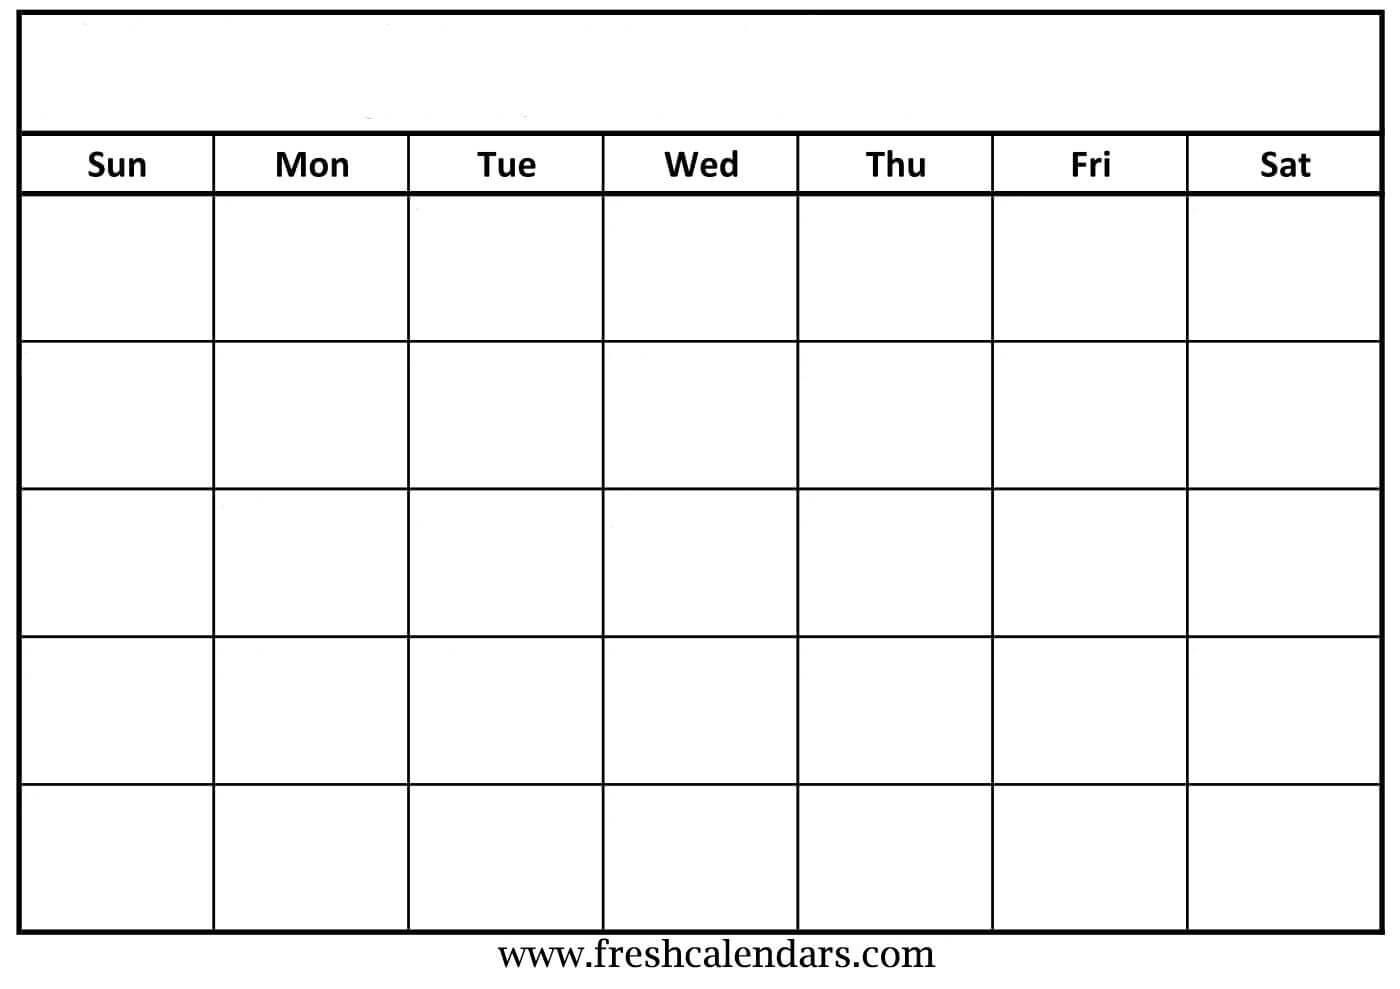 30 Blank Calendar Template 2019   Andaluzseattle Template Inside Blank Calender Template